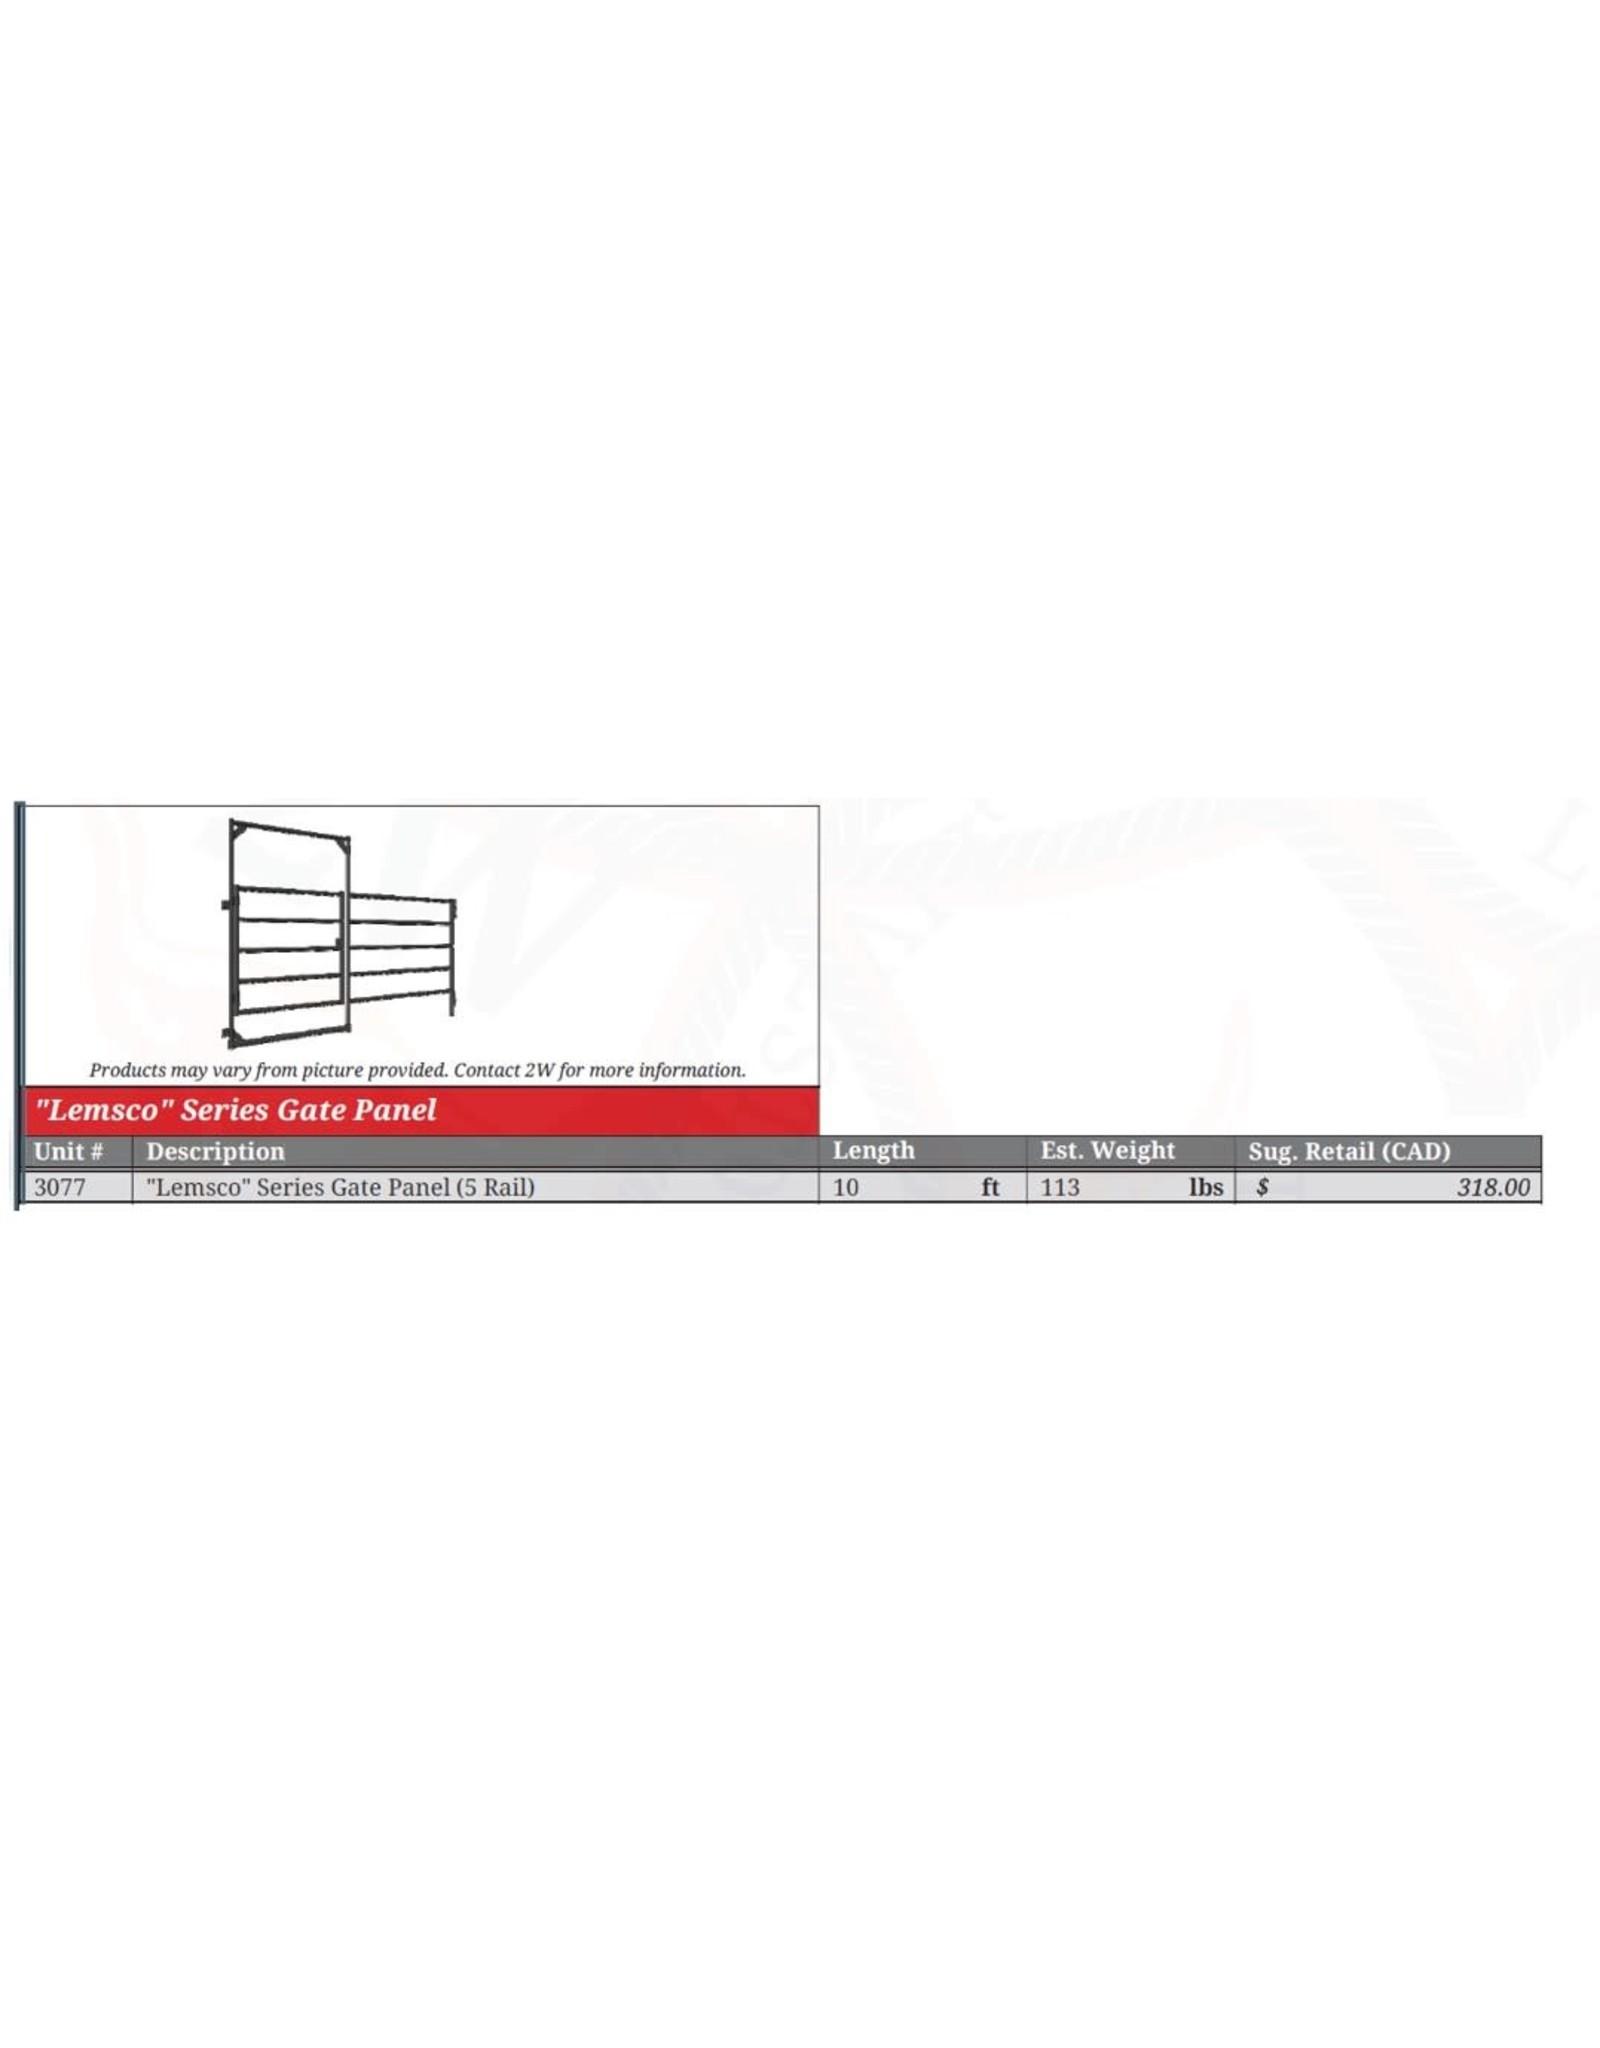 SALE  8' - Lemsco Panel with walk through gate Chain latch  (7'-8'' clearance 144lbs) ) - 3076